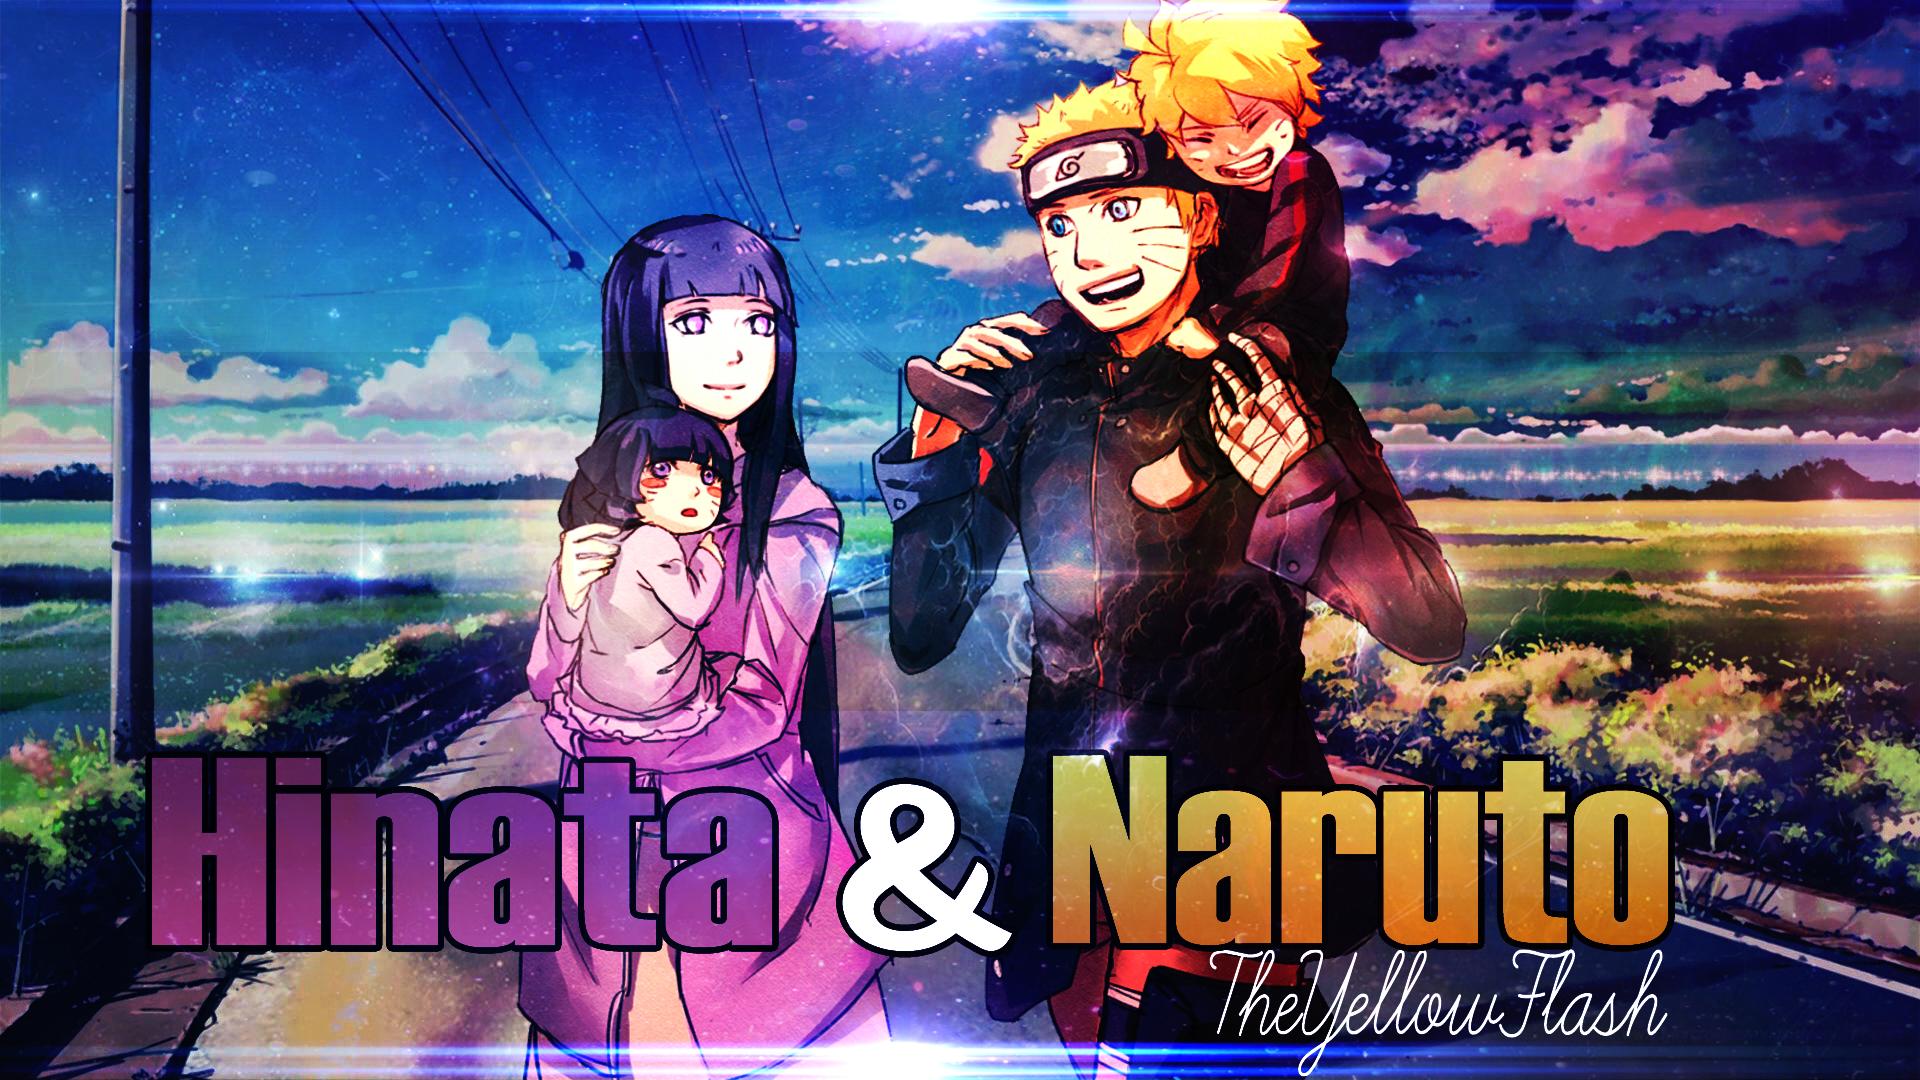 Naruto And Hinata [AMV] [Youtube Thumbnail] by TheYellowFlash1 on DeviantArt